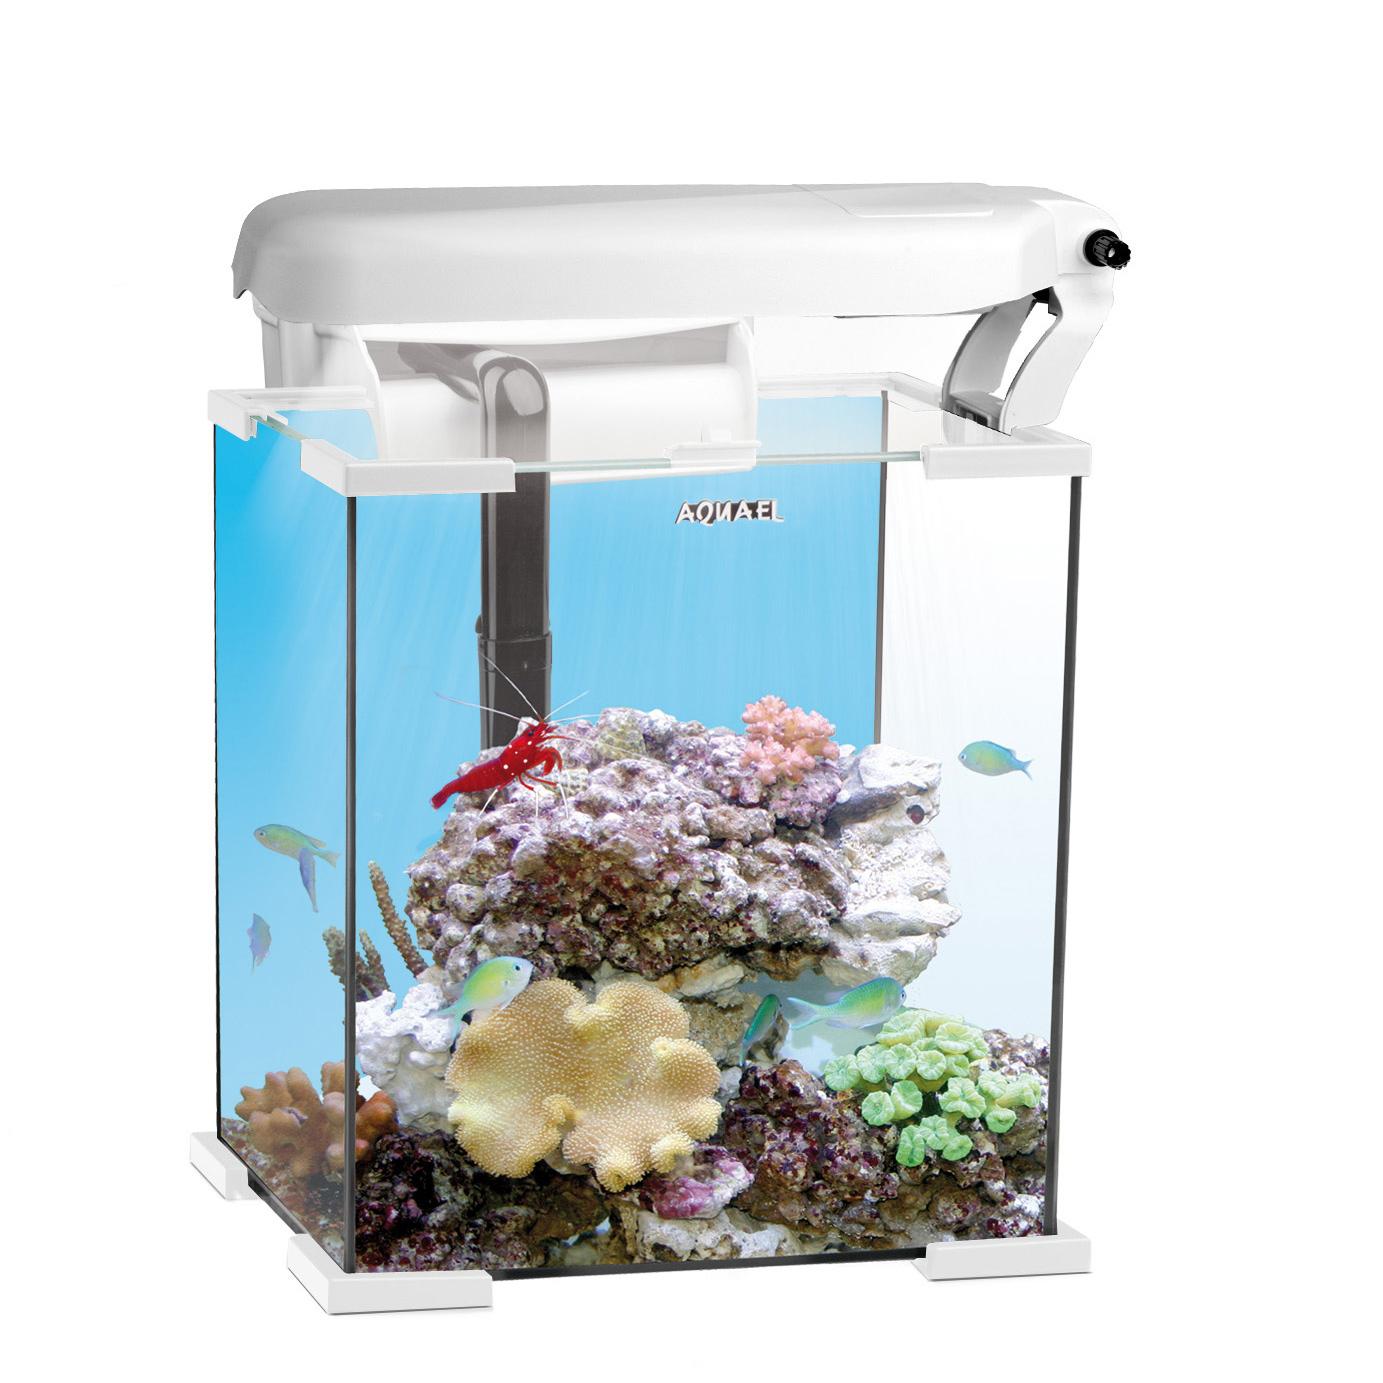 Zestaw Akwarium Nanoreef Biały 30 L Aquael Reefguard